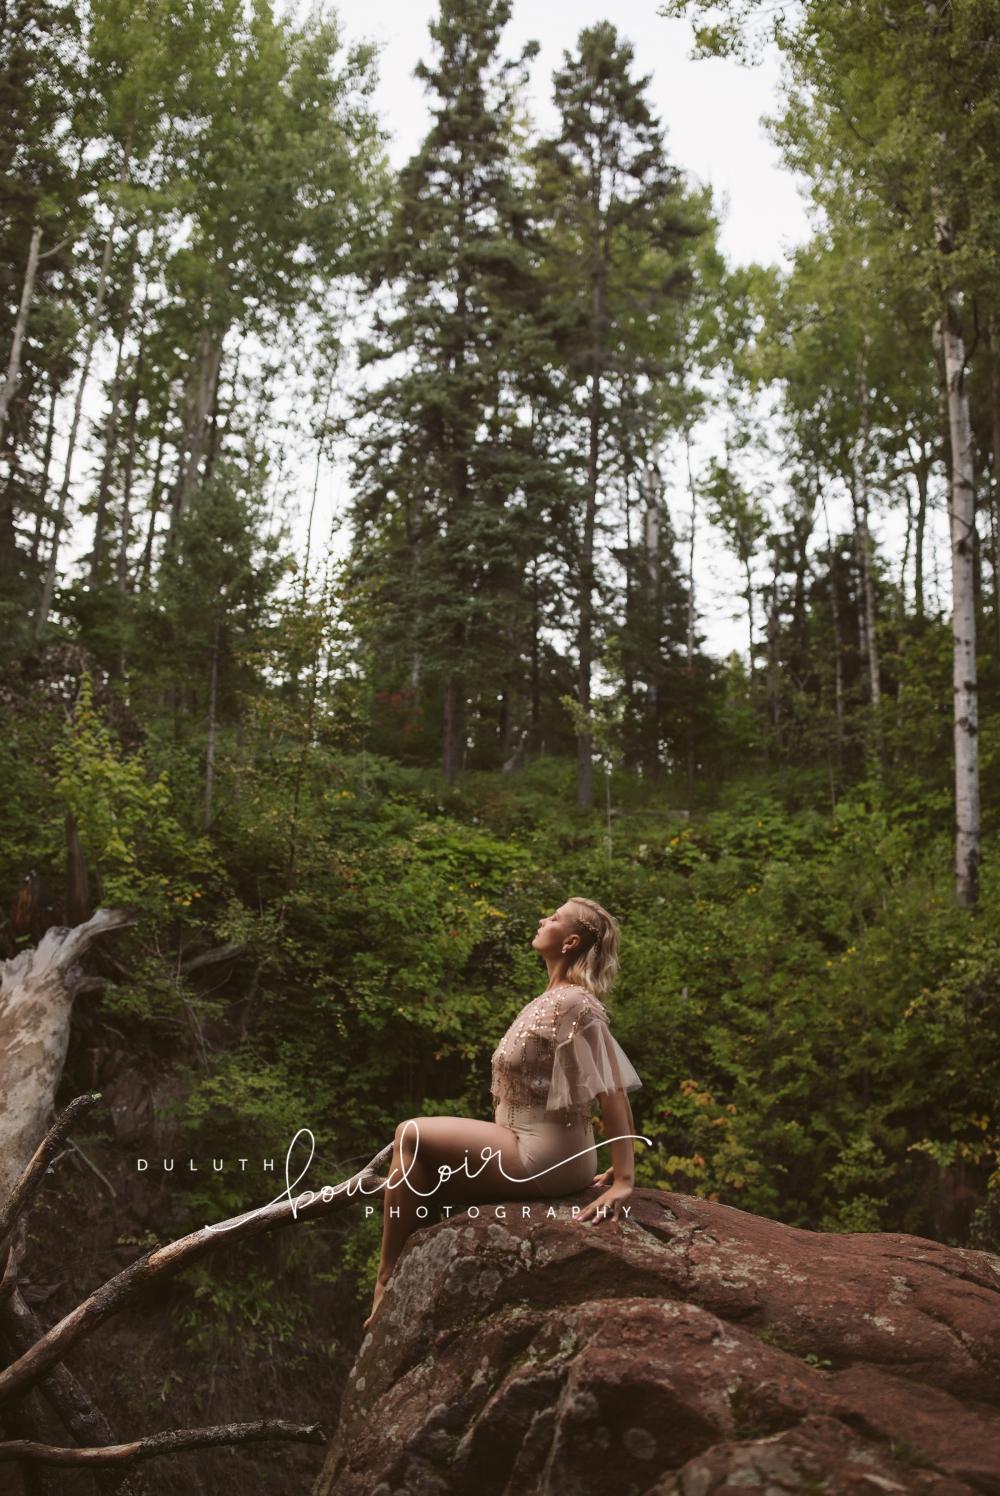 duluth-boudoir-photography-andrea-48